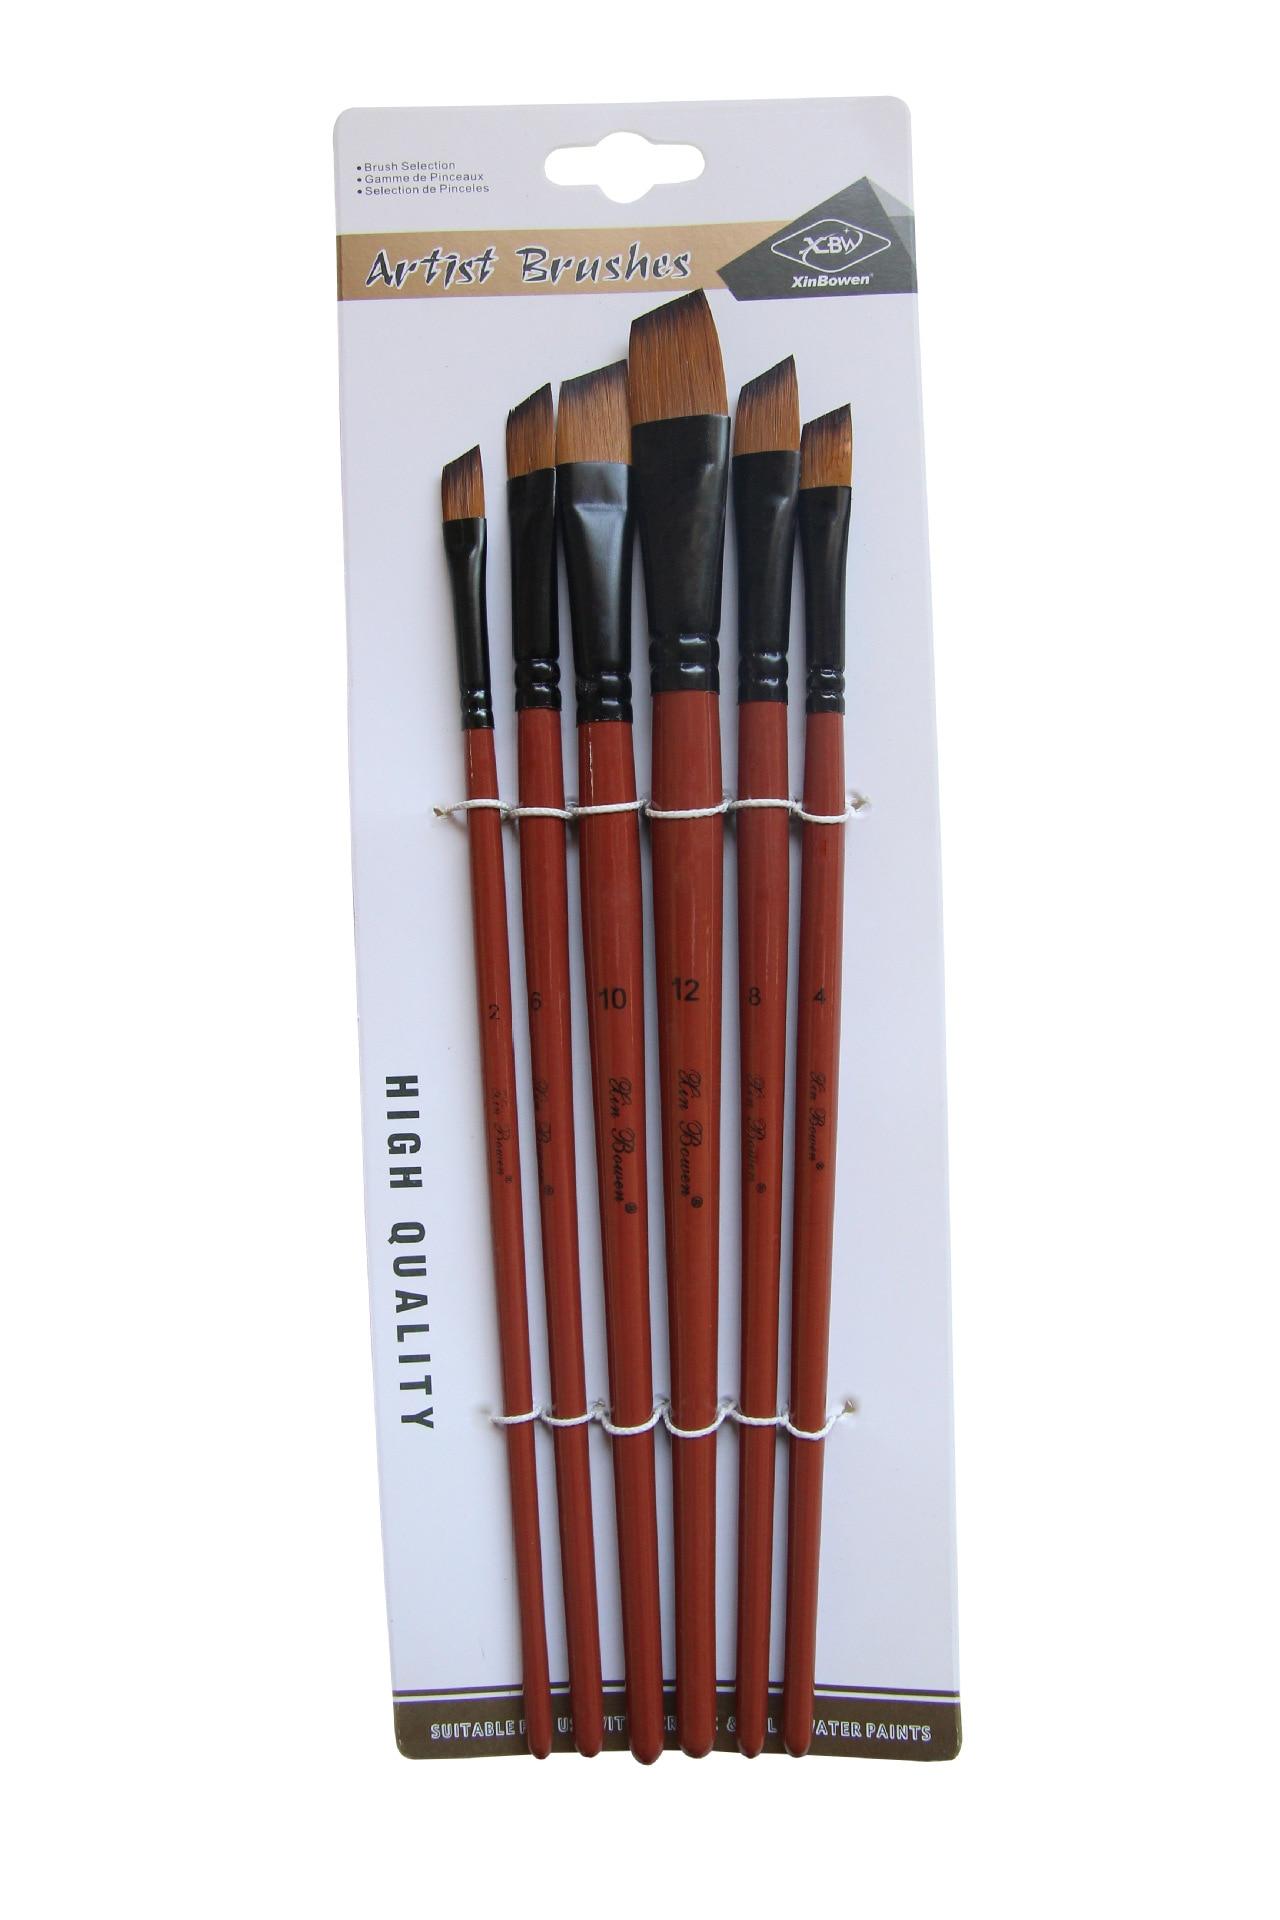 Купить с кэшбэком Nylon Hair Oil Paint Brush Round Filbert Angel Flat Acrylic Learning Diy Watercolor Pen for Artists Painters Beginners, 6Pcs/set